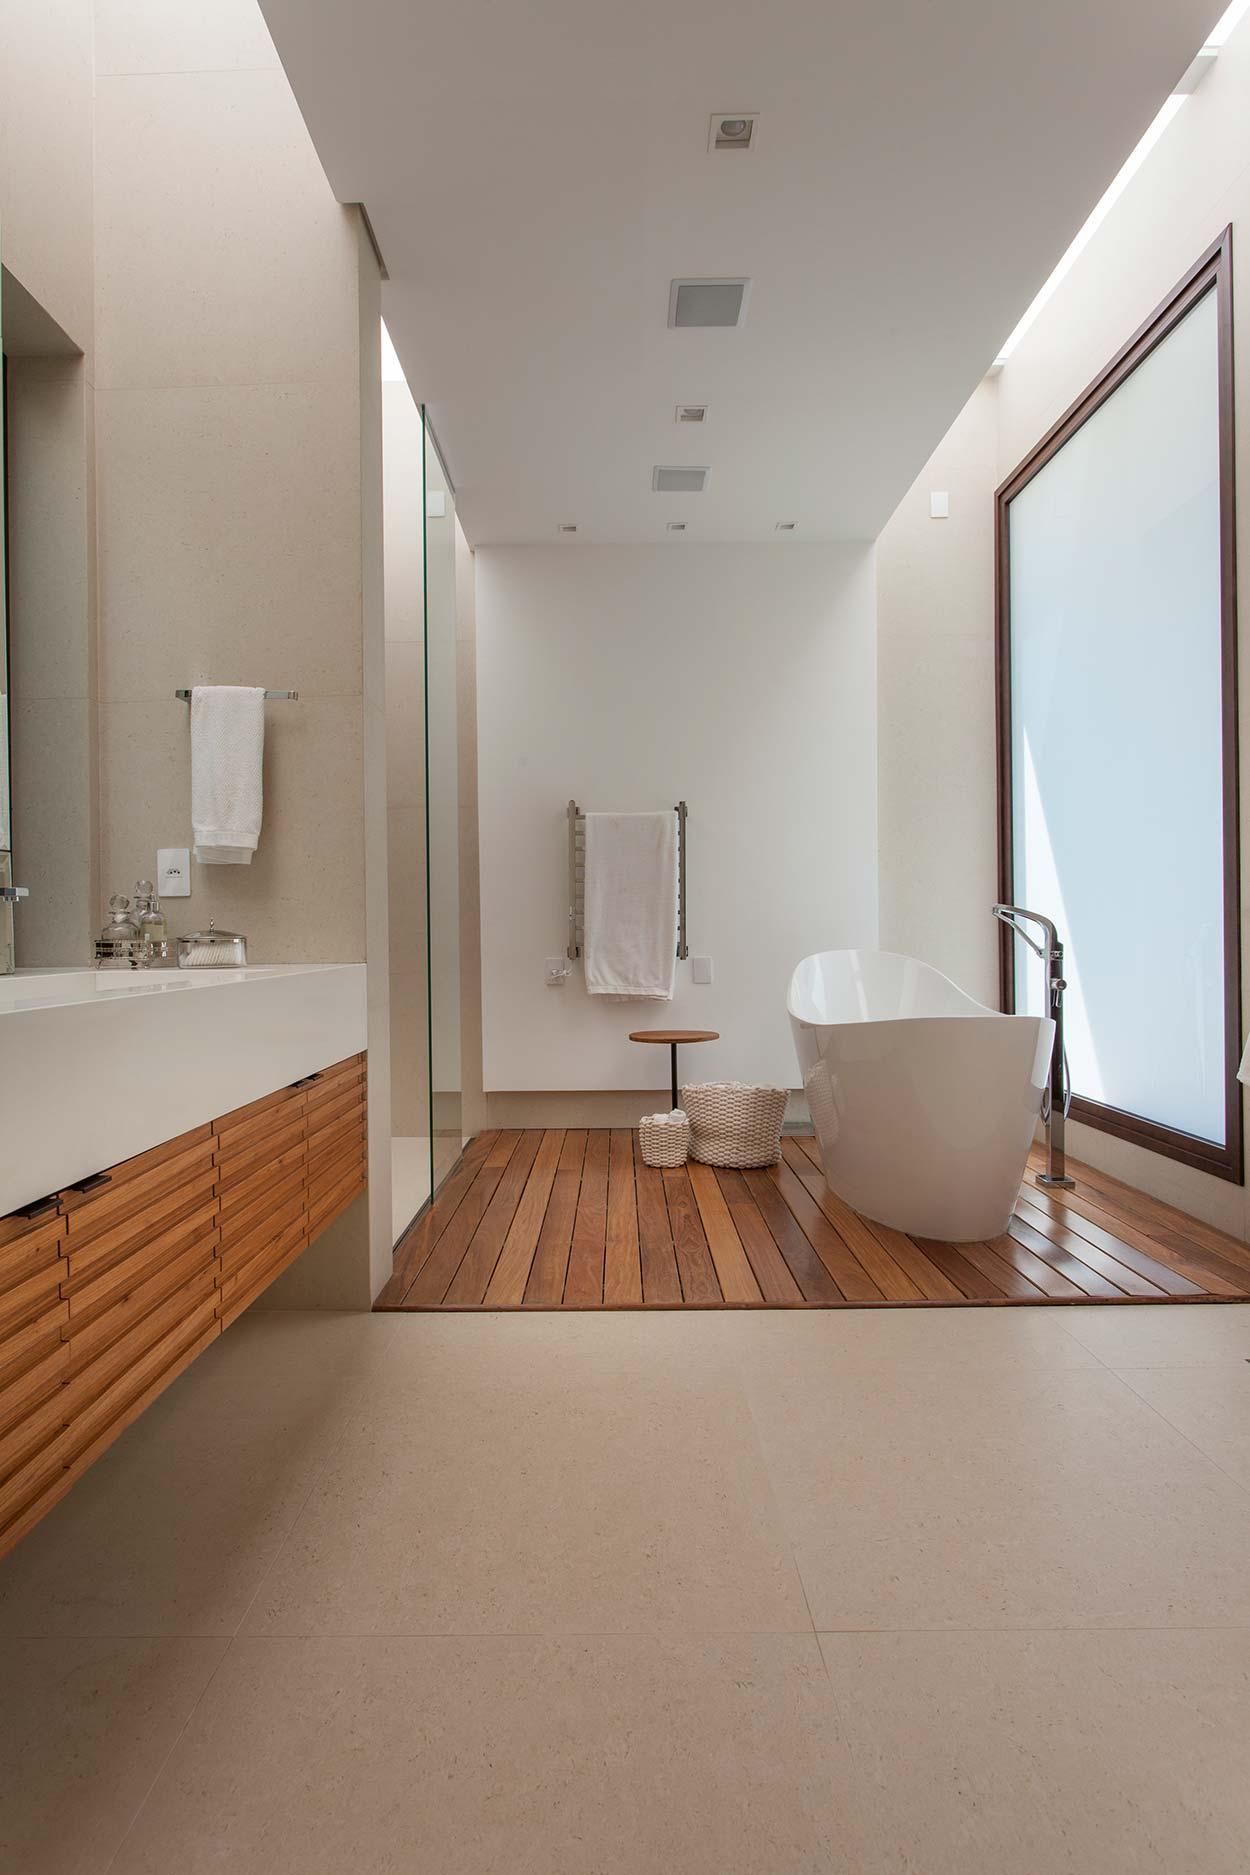 veridianaperes-interiores-Residencia-ER55